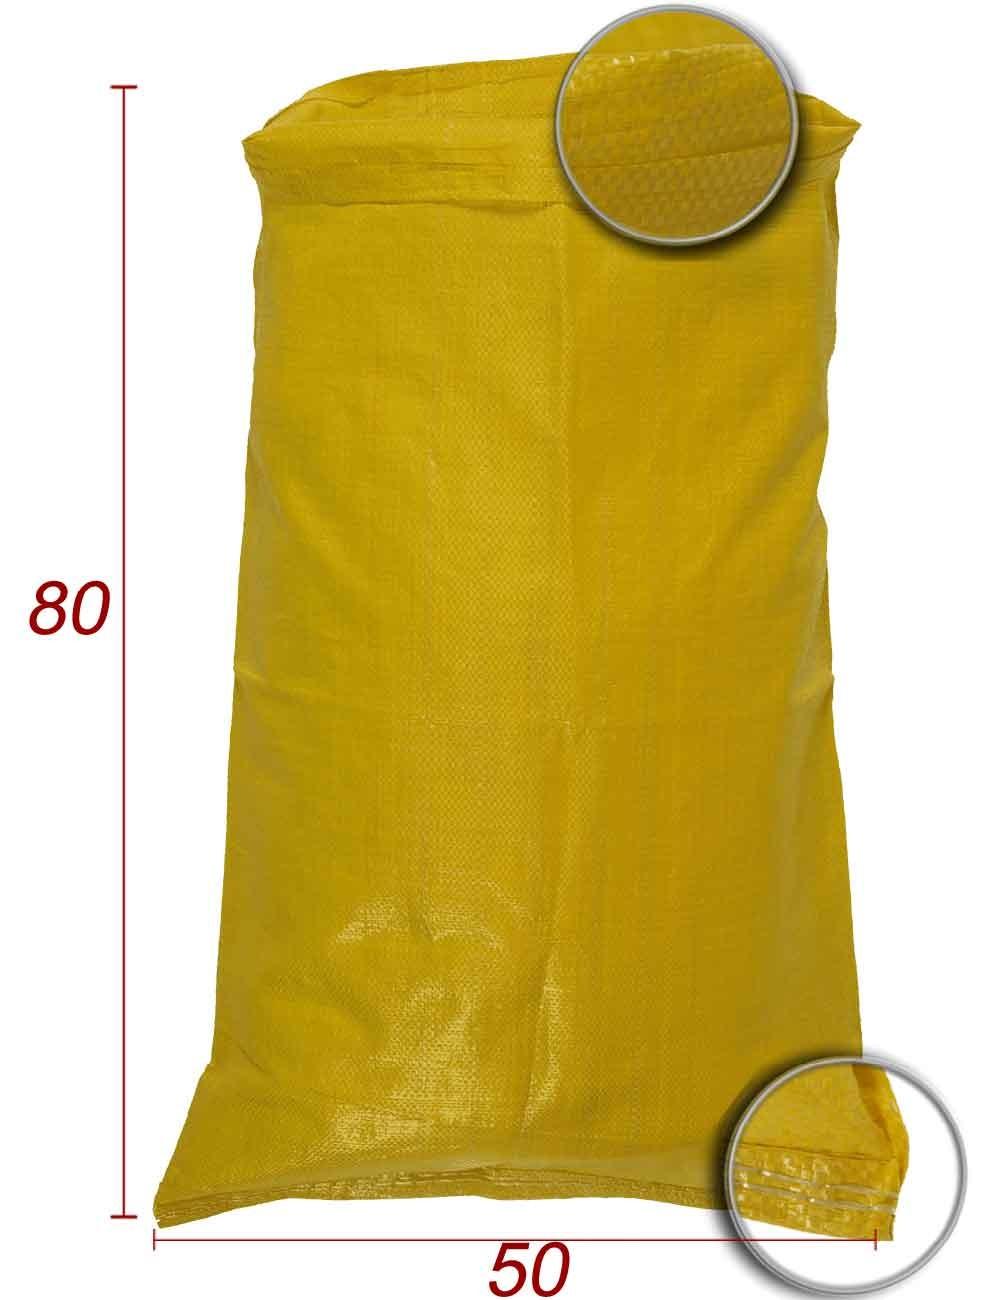 Bolsas de embalaje en Polipropileno Amarillo